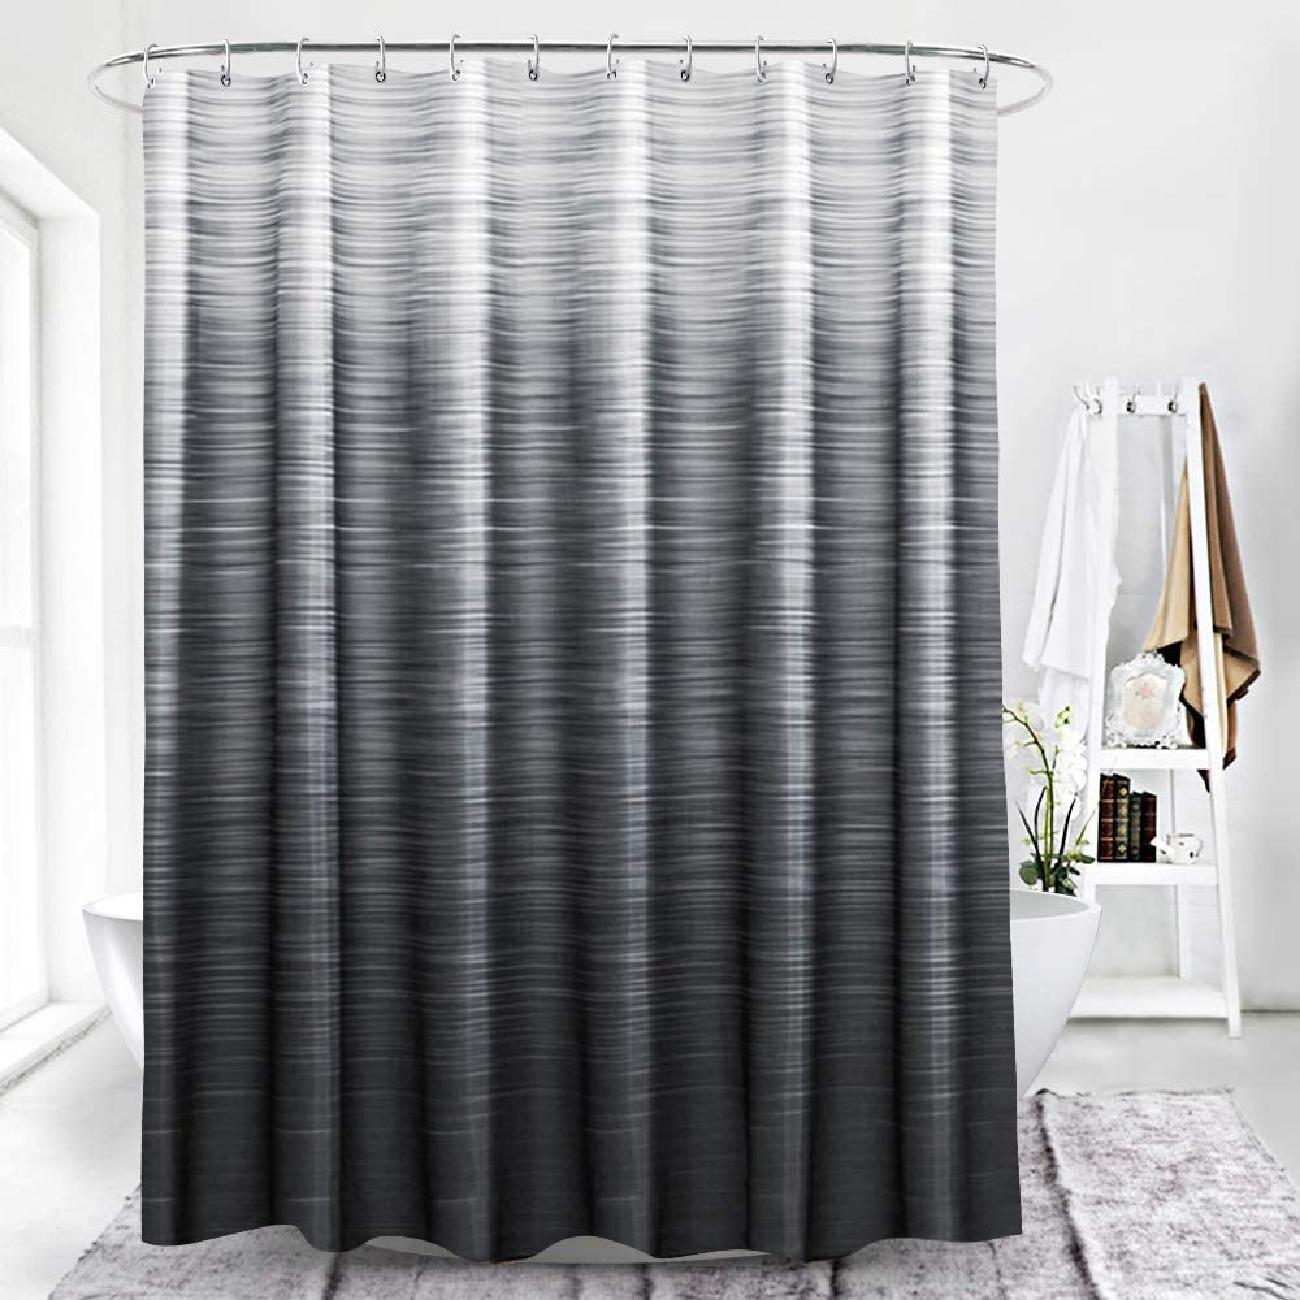 Orren Ellis Ombre Shower Curtain For